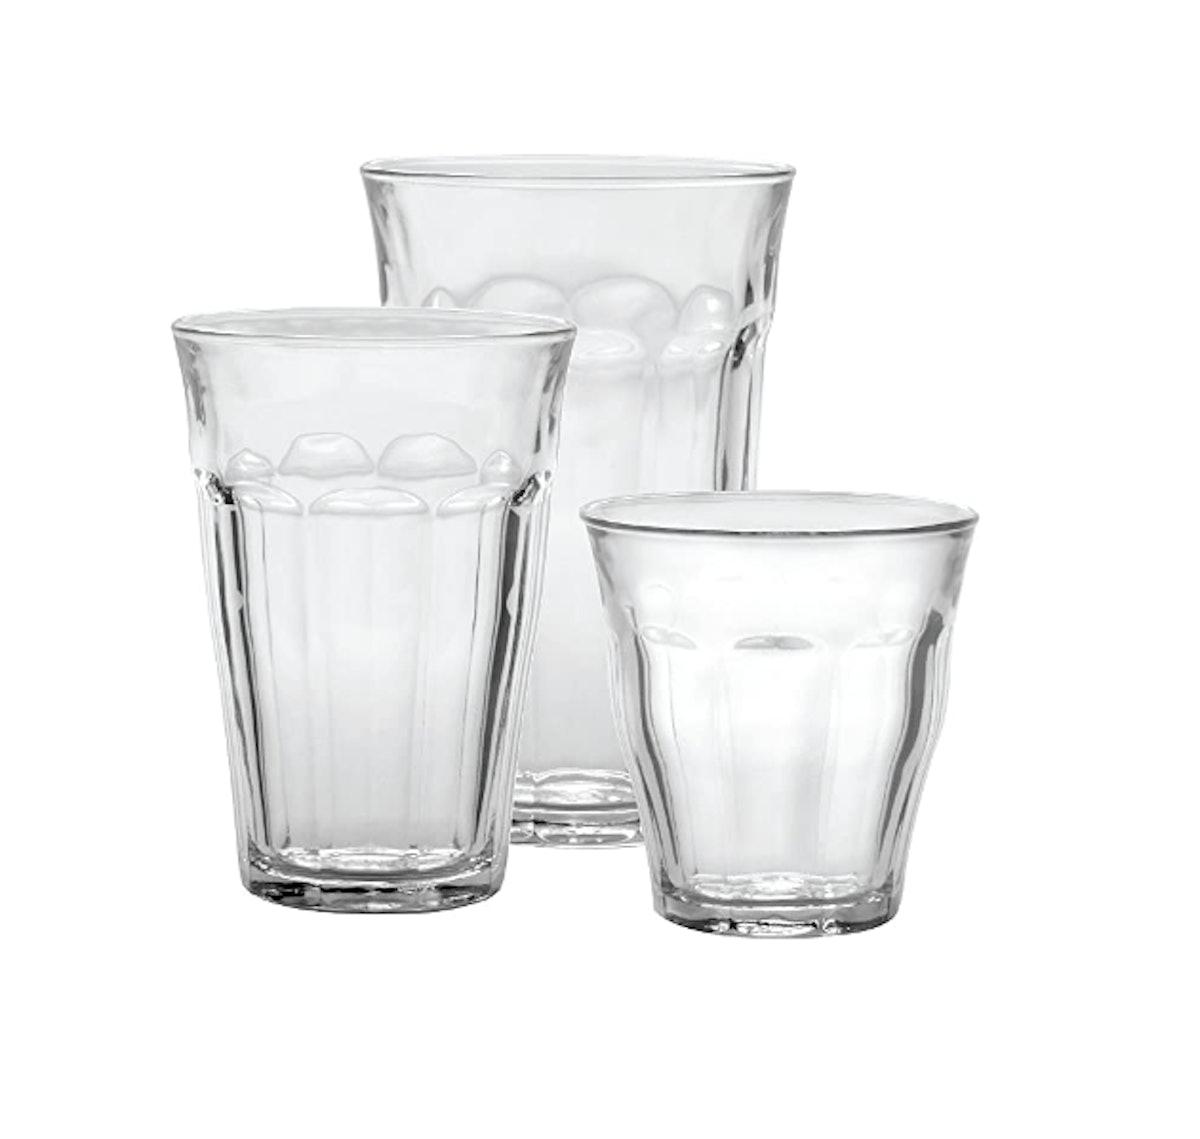 Duralex Clear Drinking Glasses & Tumbler Set